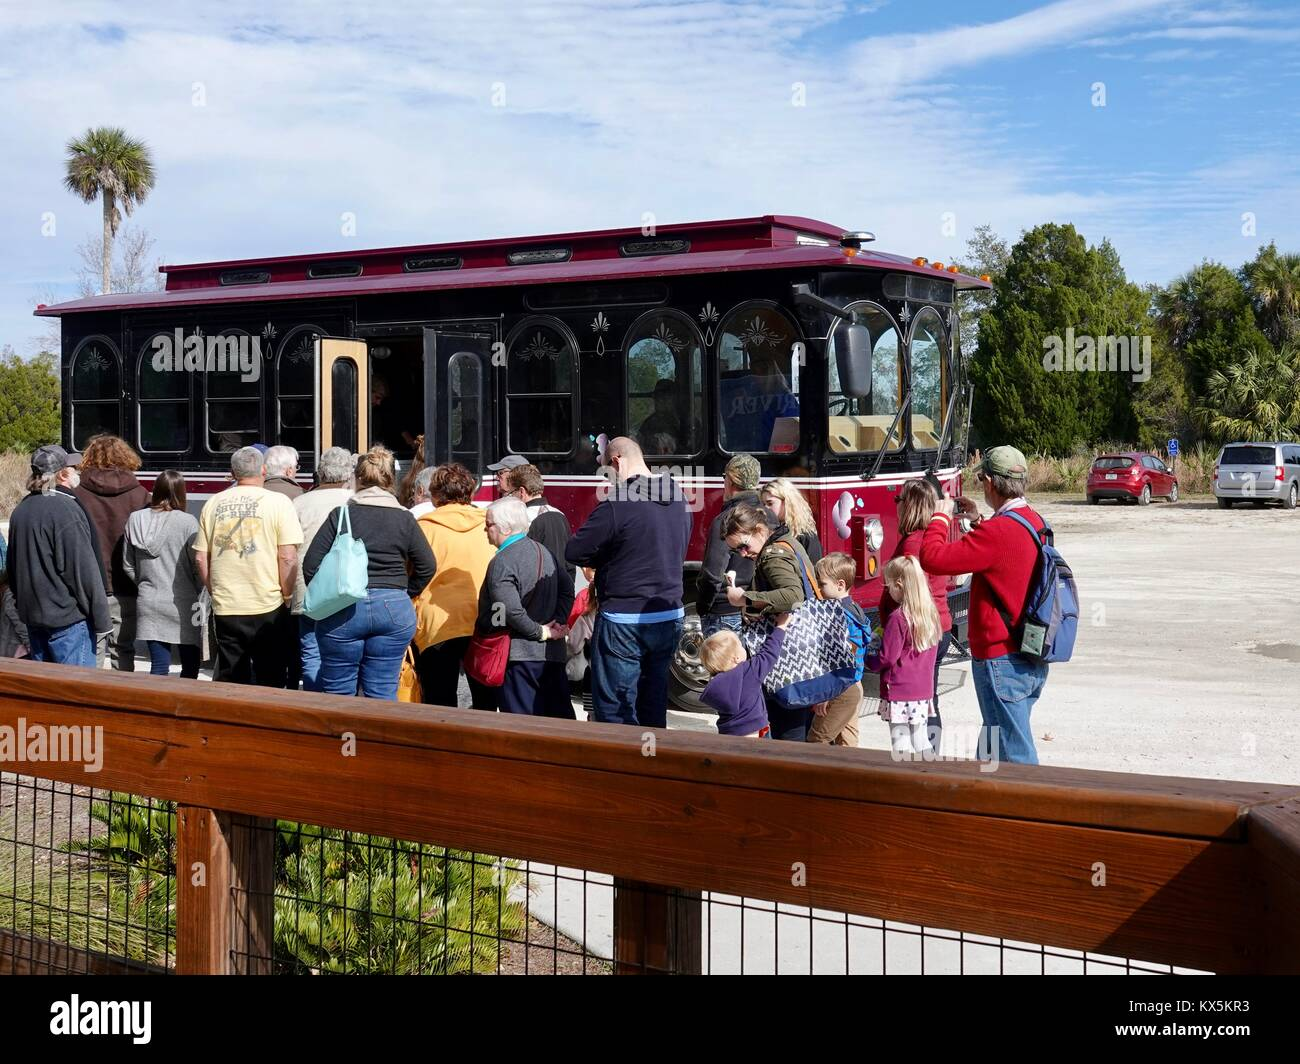 Visitors waiting to board trolley at Three Sisters Springs Nature Park, Crystal River, Florida, USA. - Stock Image